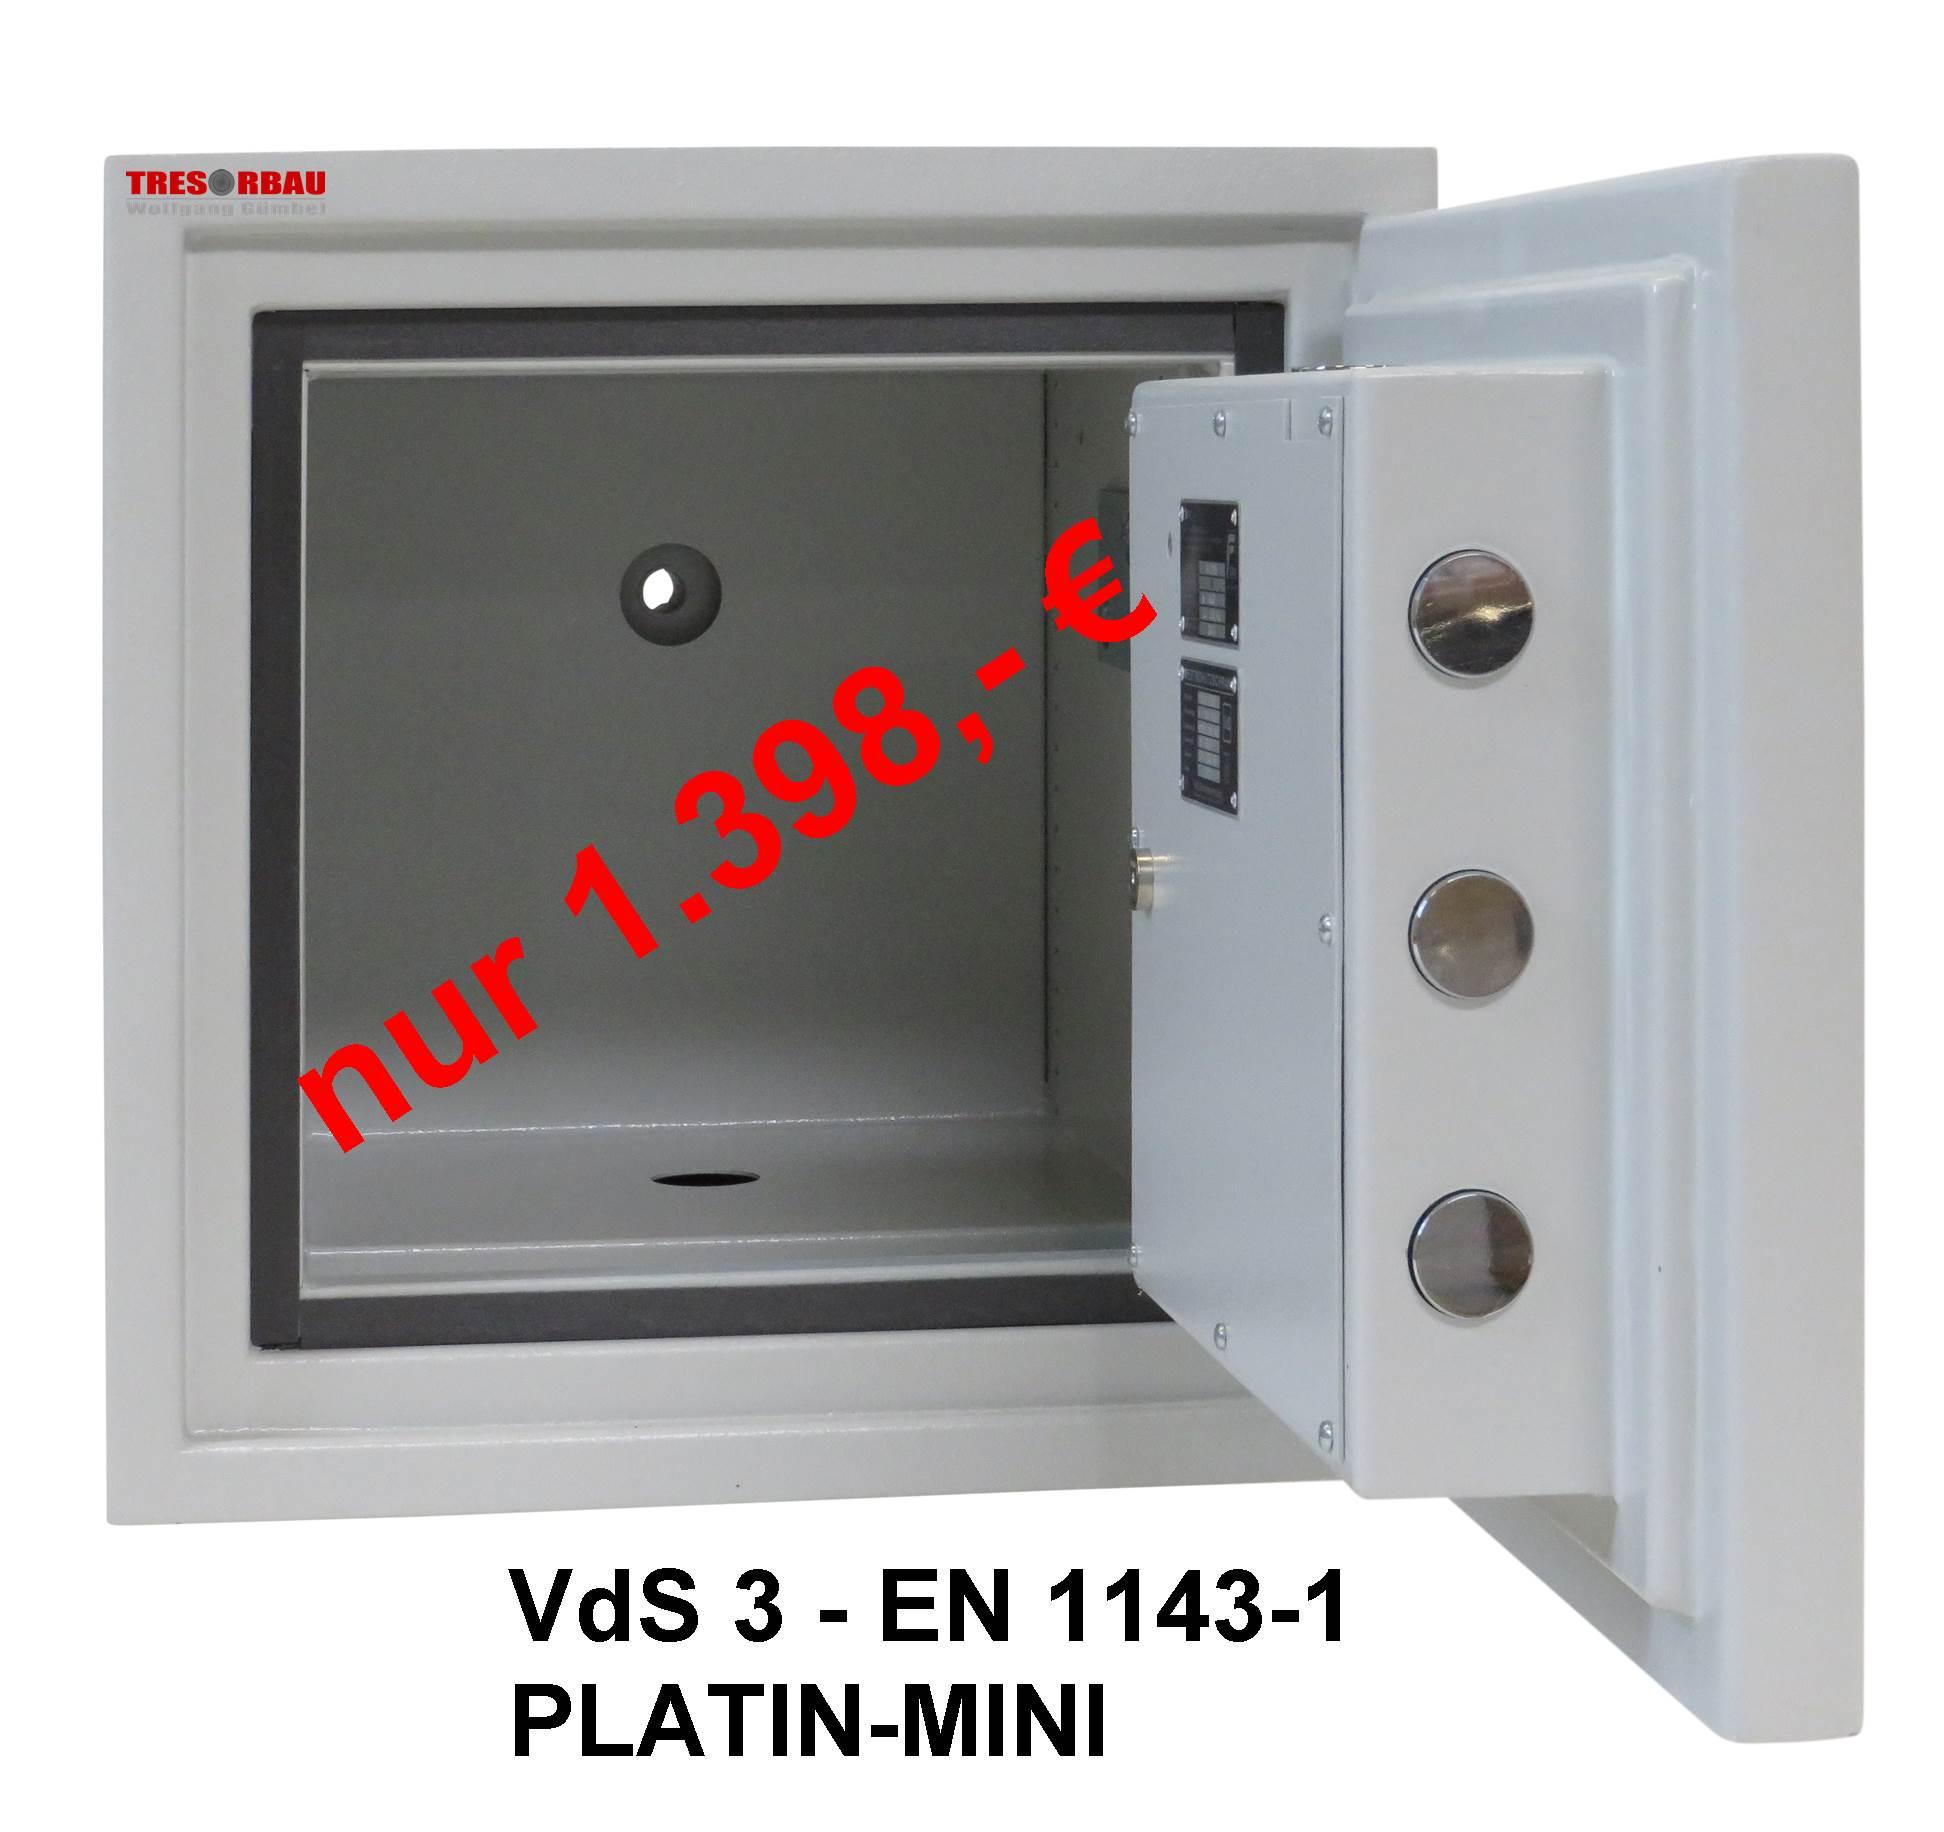 Wertschutzschrank PLATIN-Mini VdS 3